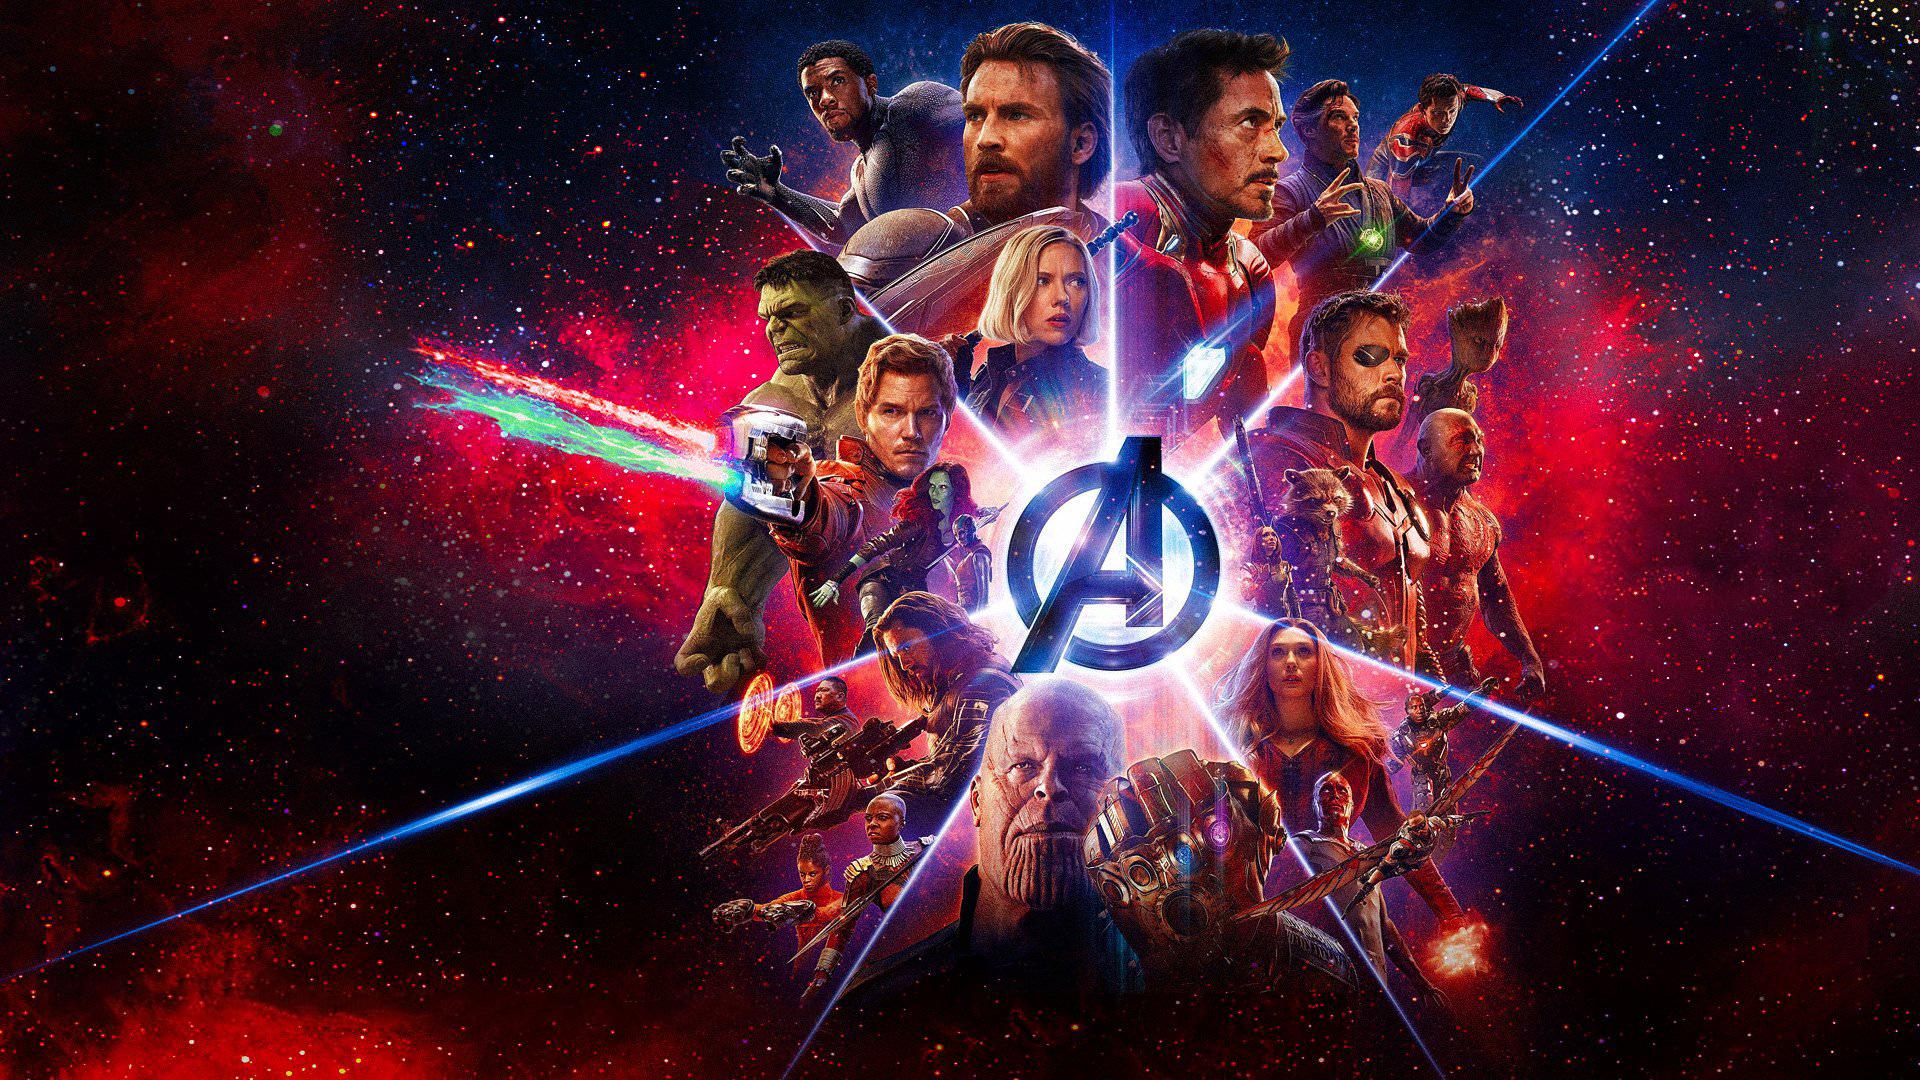 Avengers Infinity War Hd Wallpaper Background Image